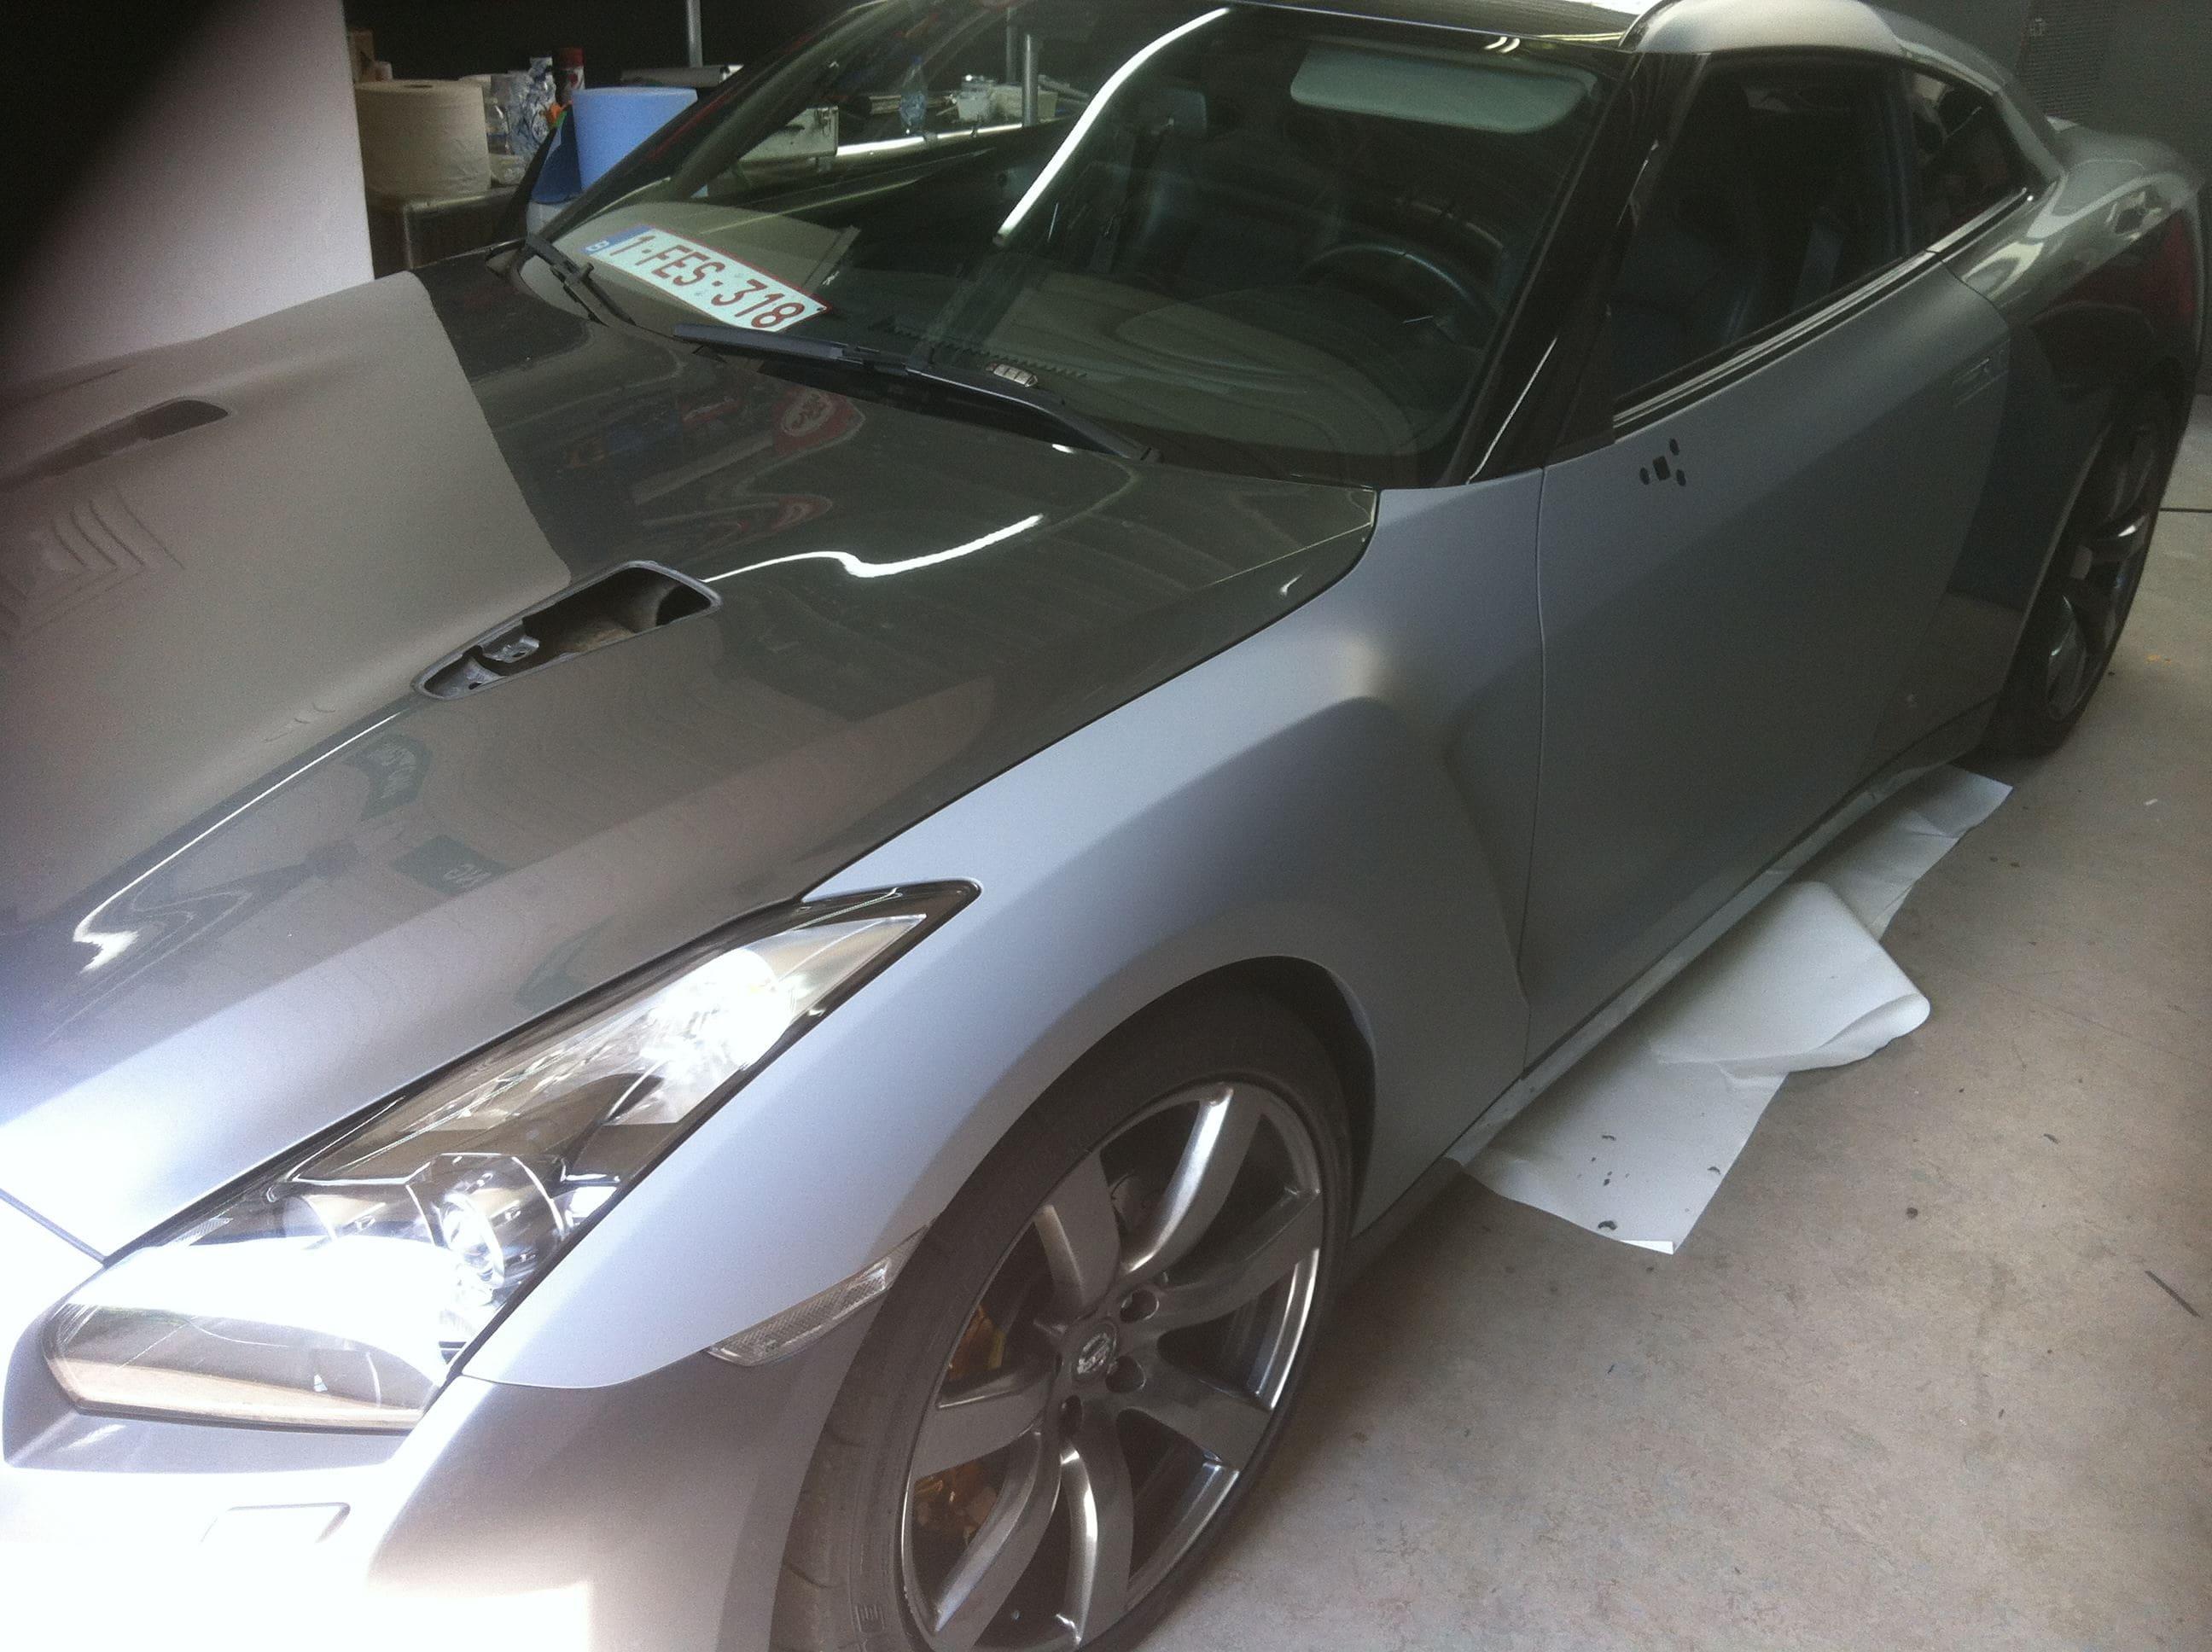 Nissan GT-R met Mat Grijze Wrap, Carwrapping door Wrapmyride.nu Foto-nr:6545, ©2020